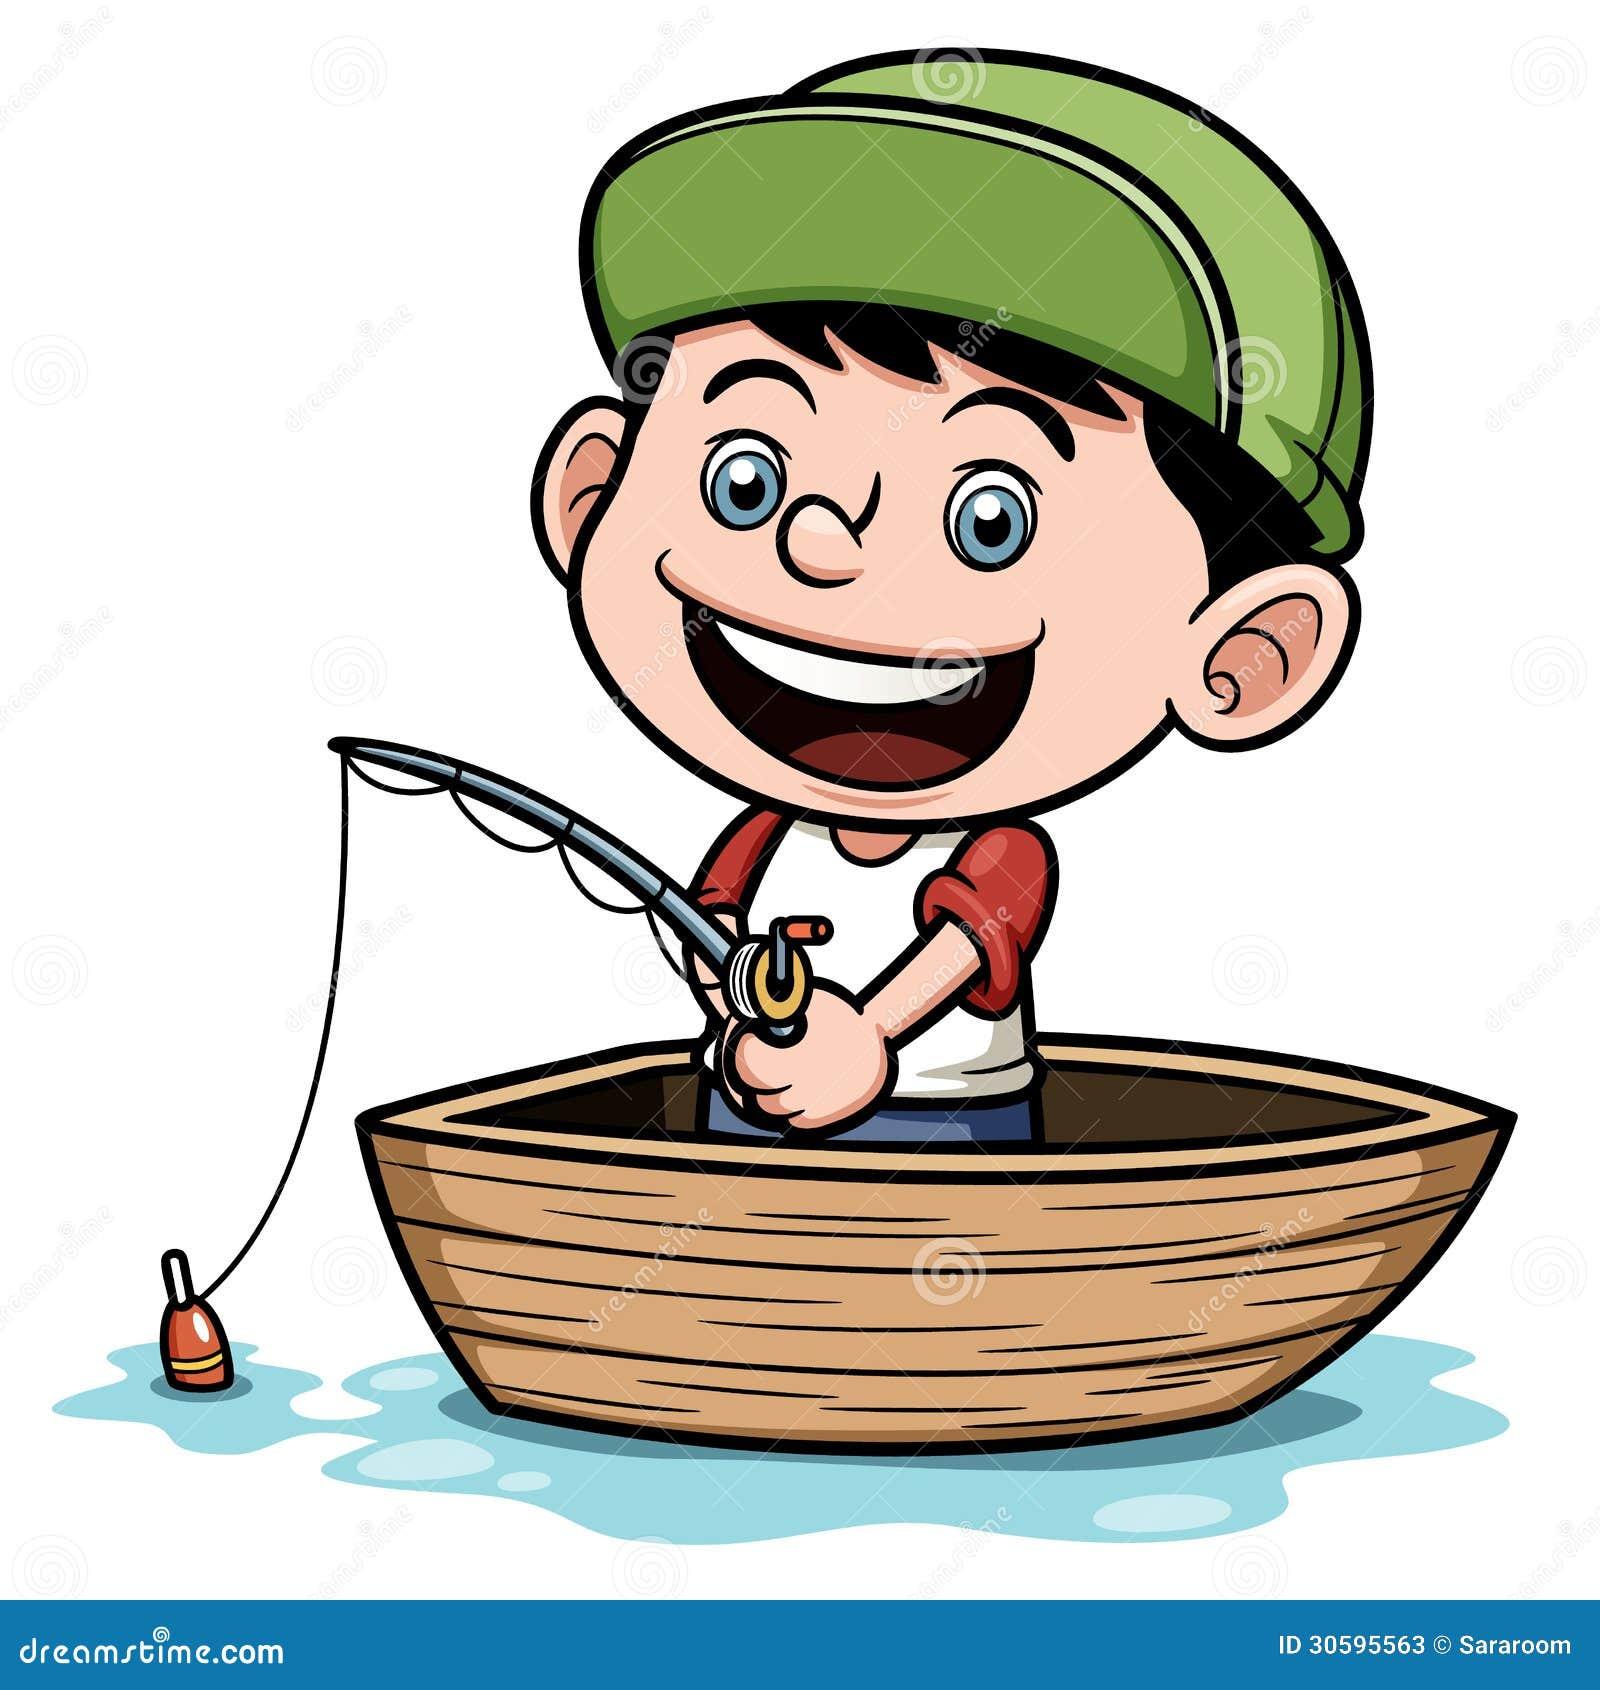 Child Background clipart - Fishing, Child, Cartoon, transparent clip art